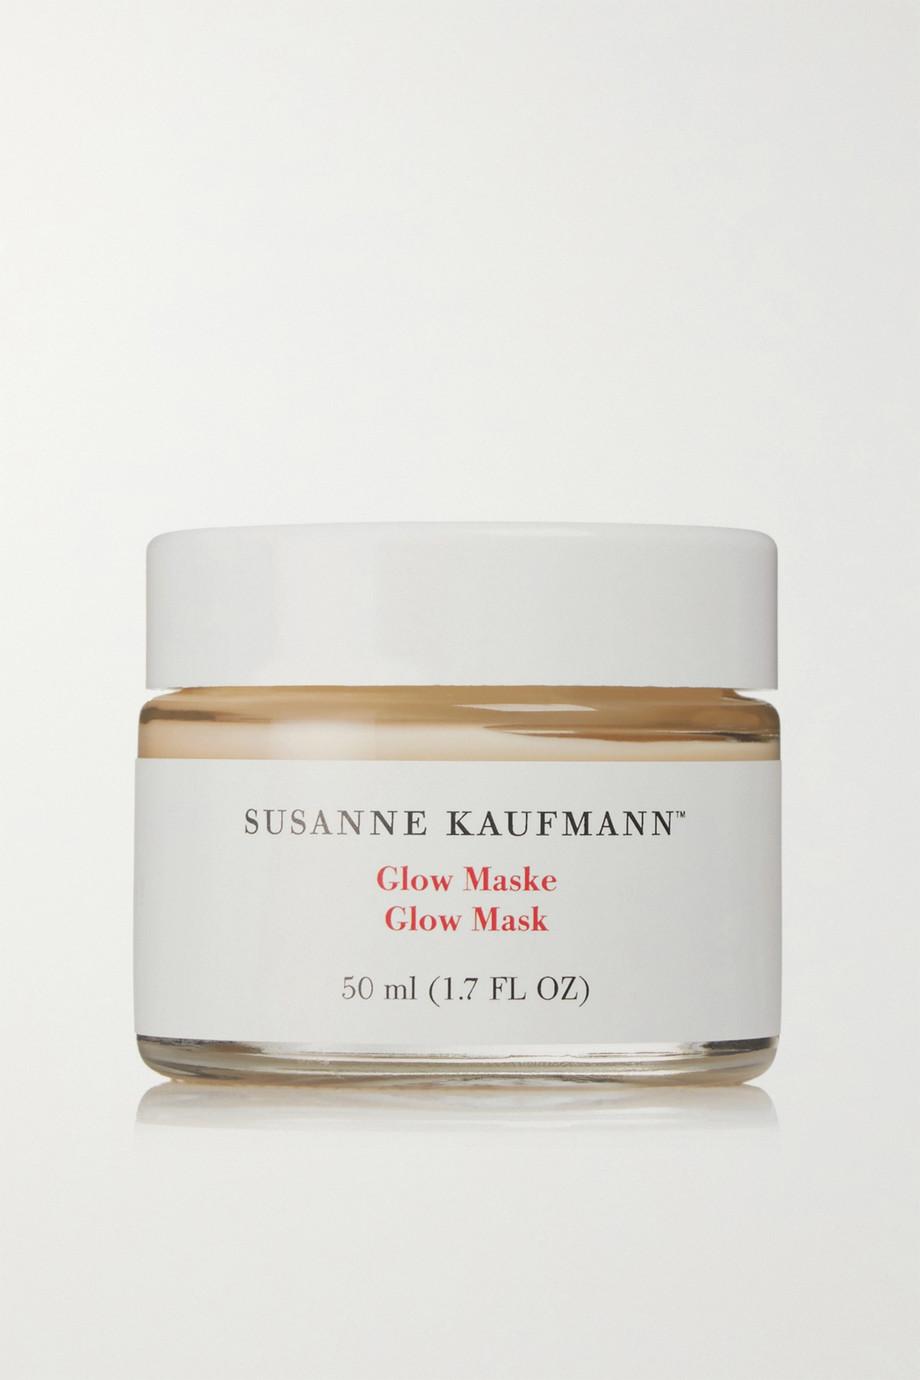 Susanne Kaufmann Glow Mask, 50ml